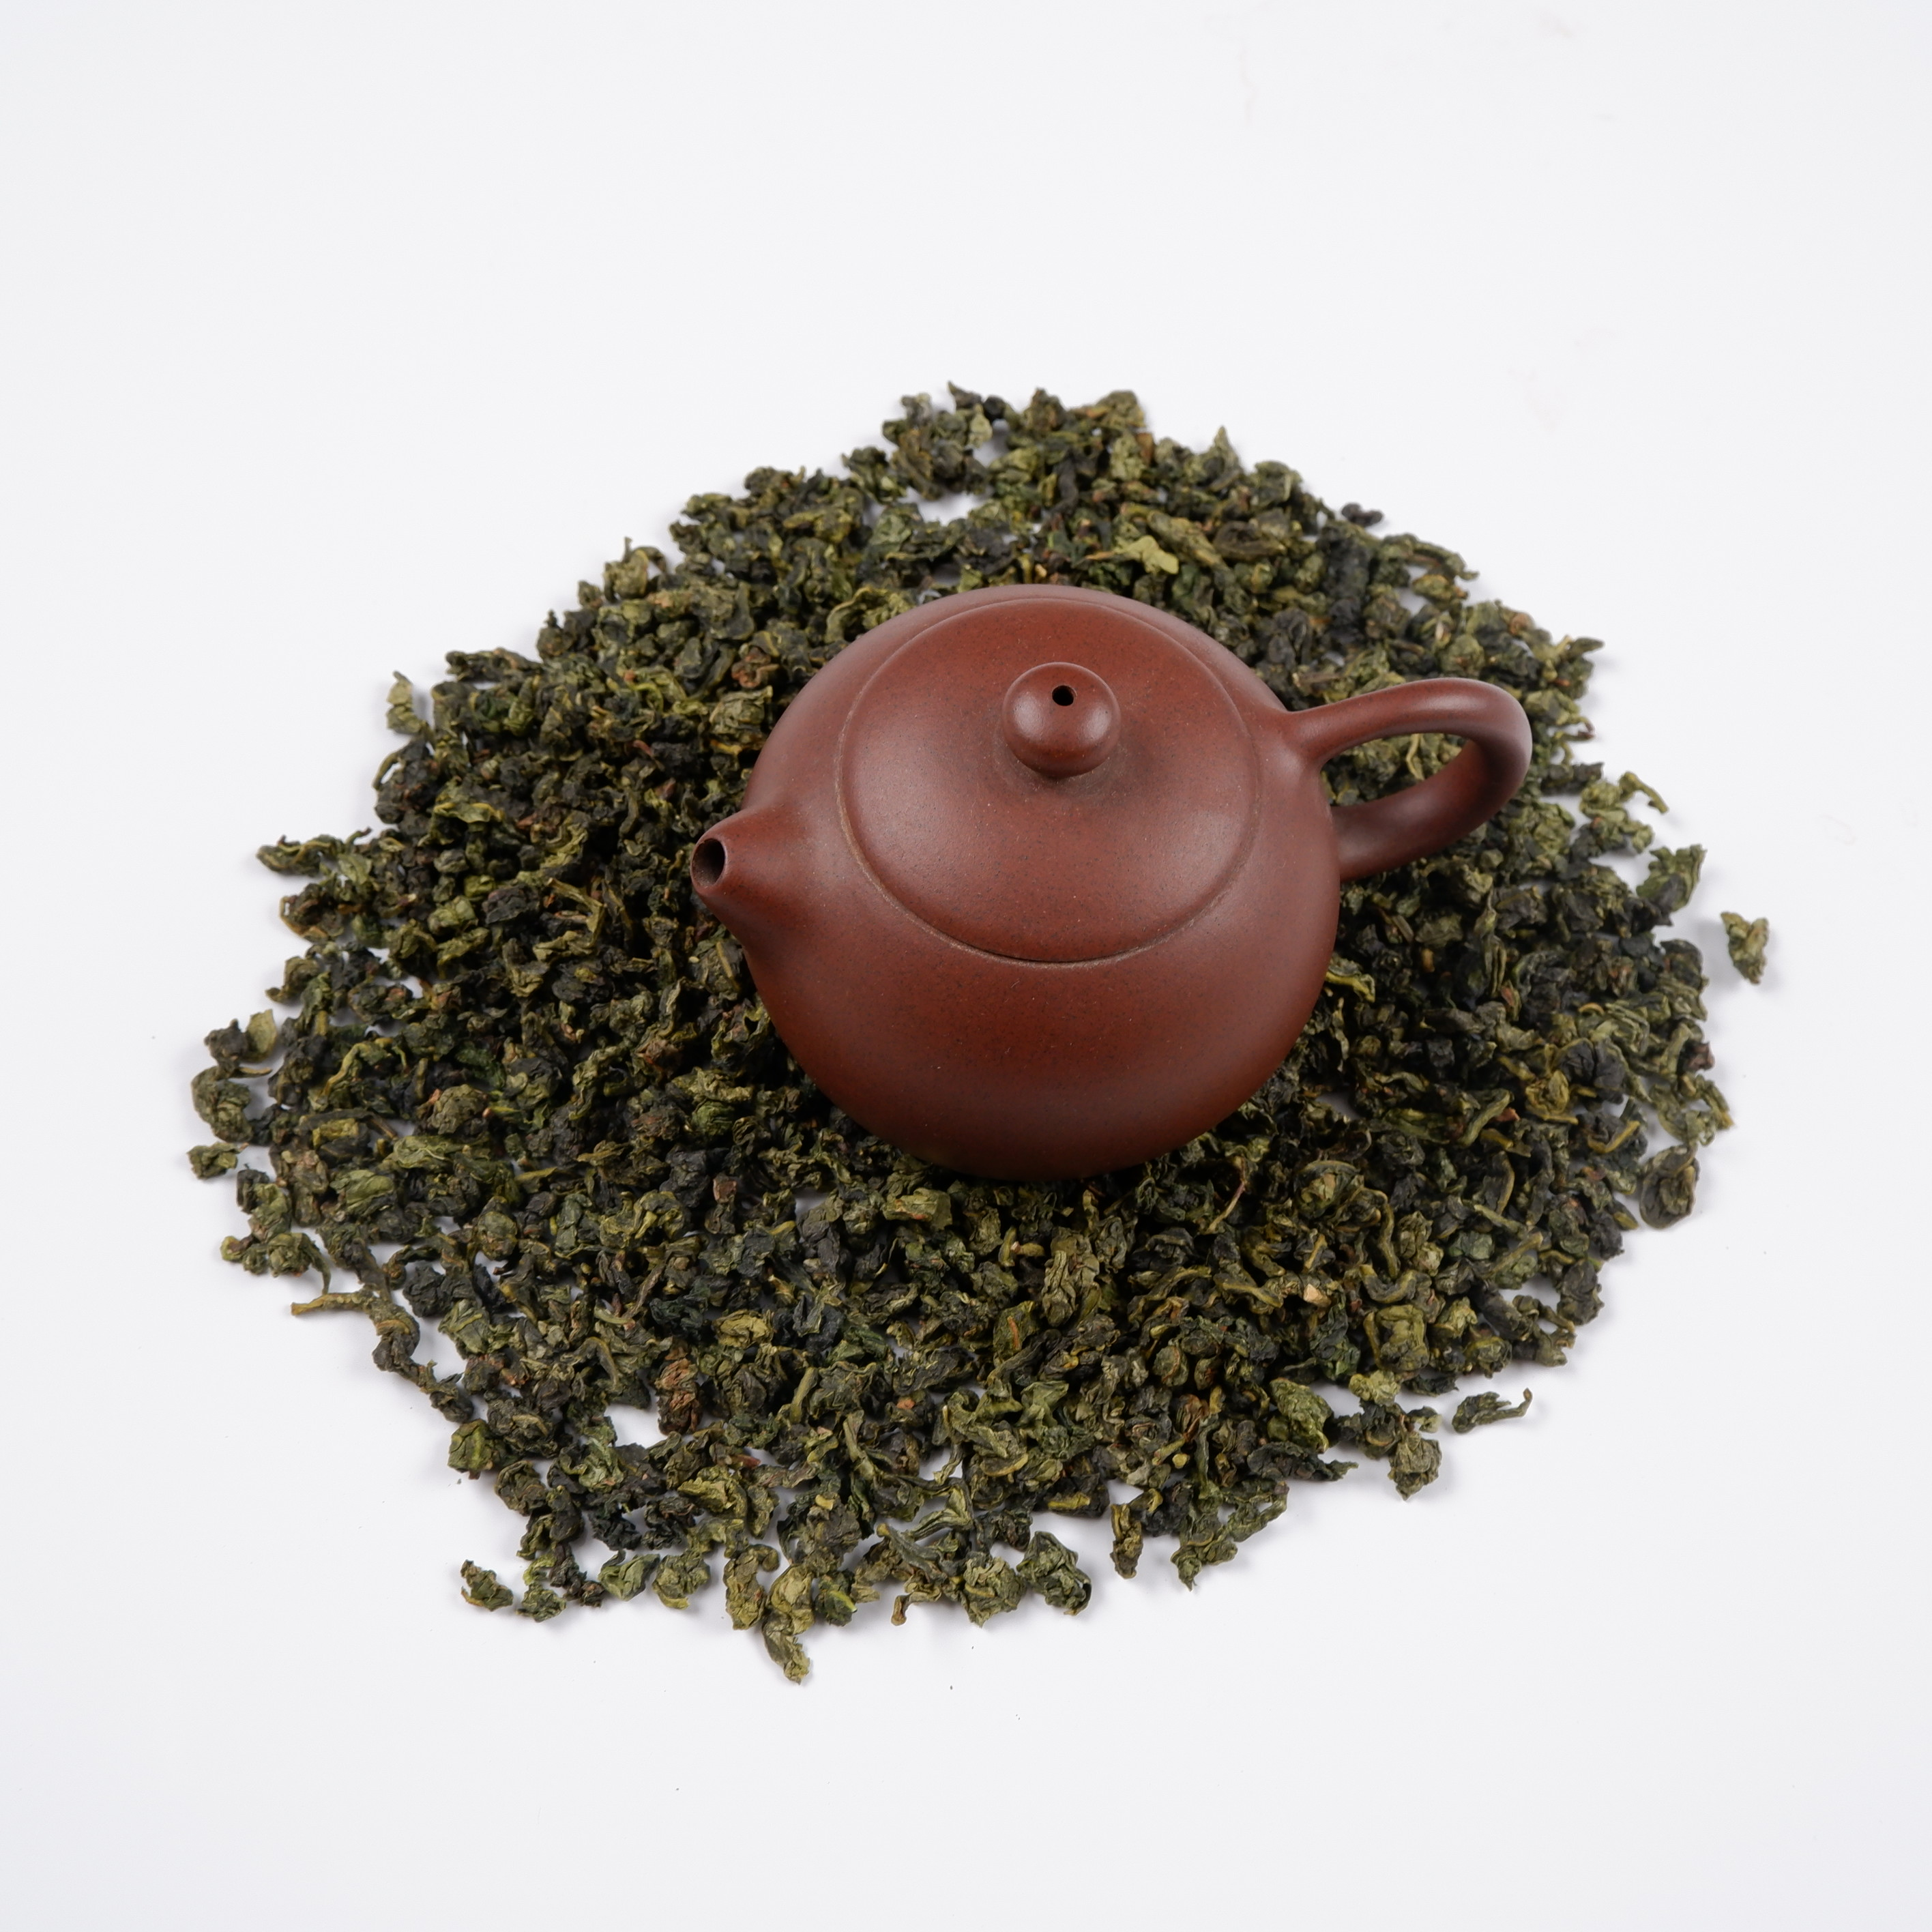 High Quality Chinese Oolong Tea for Cheap Price - 4uTea | 4uTea.com